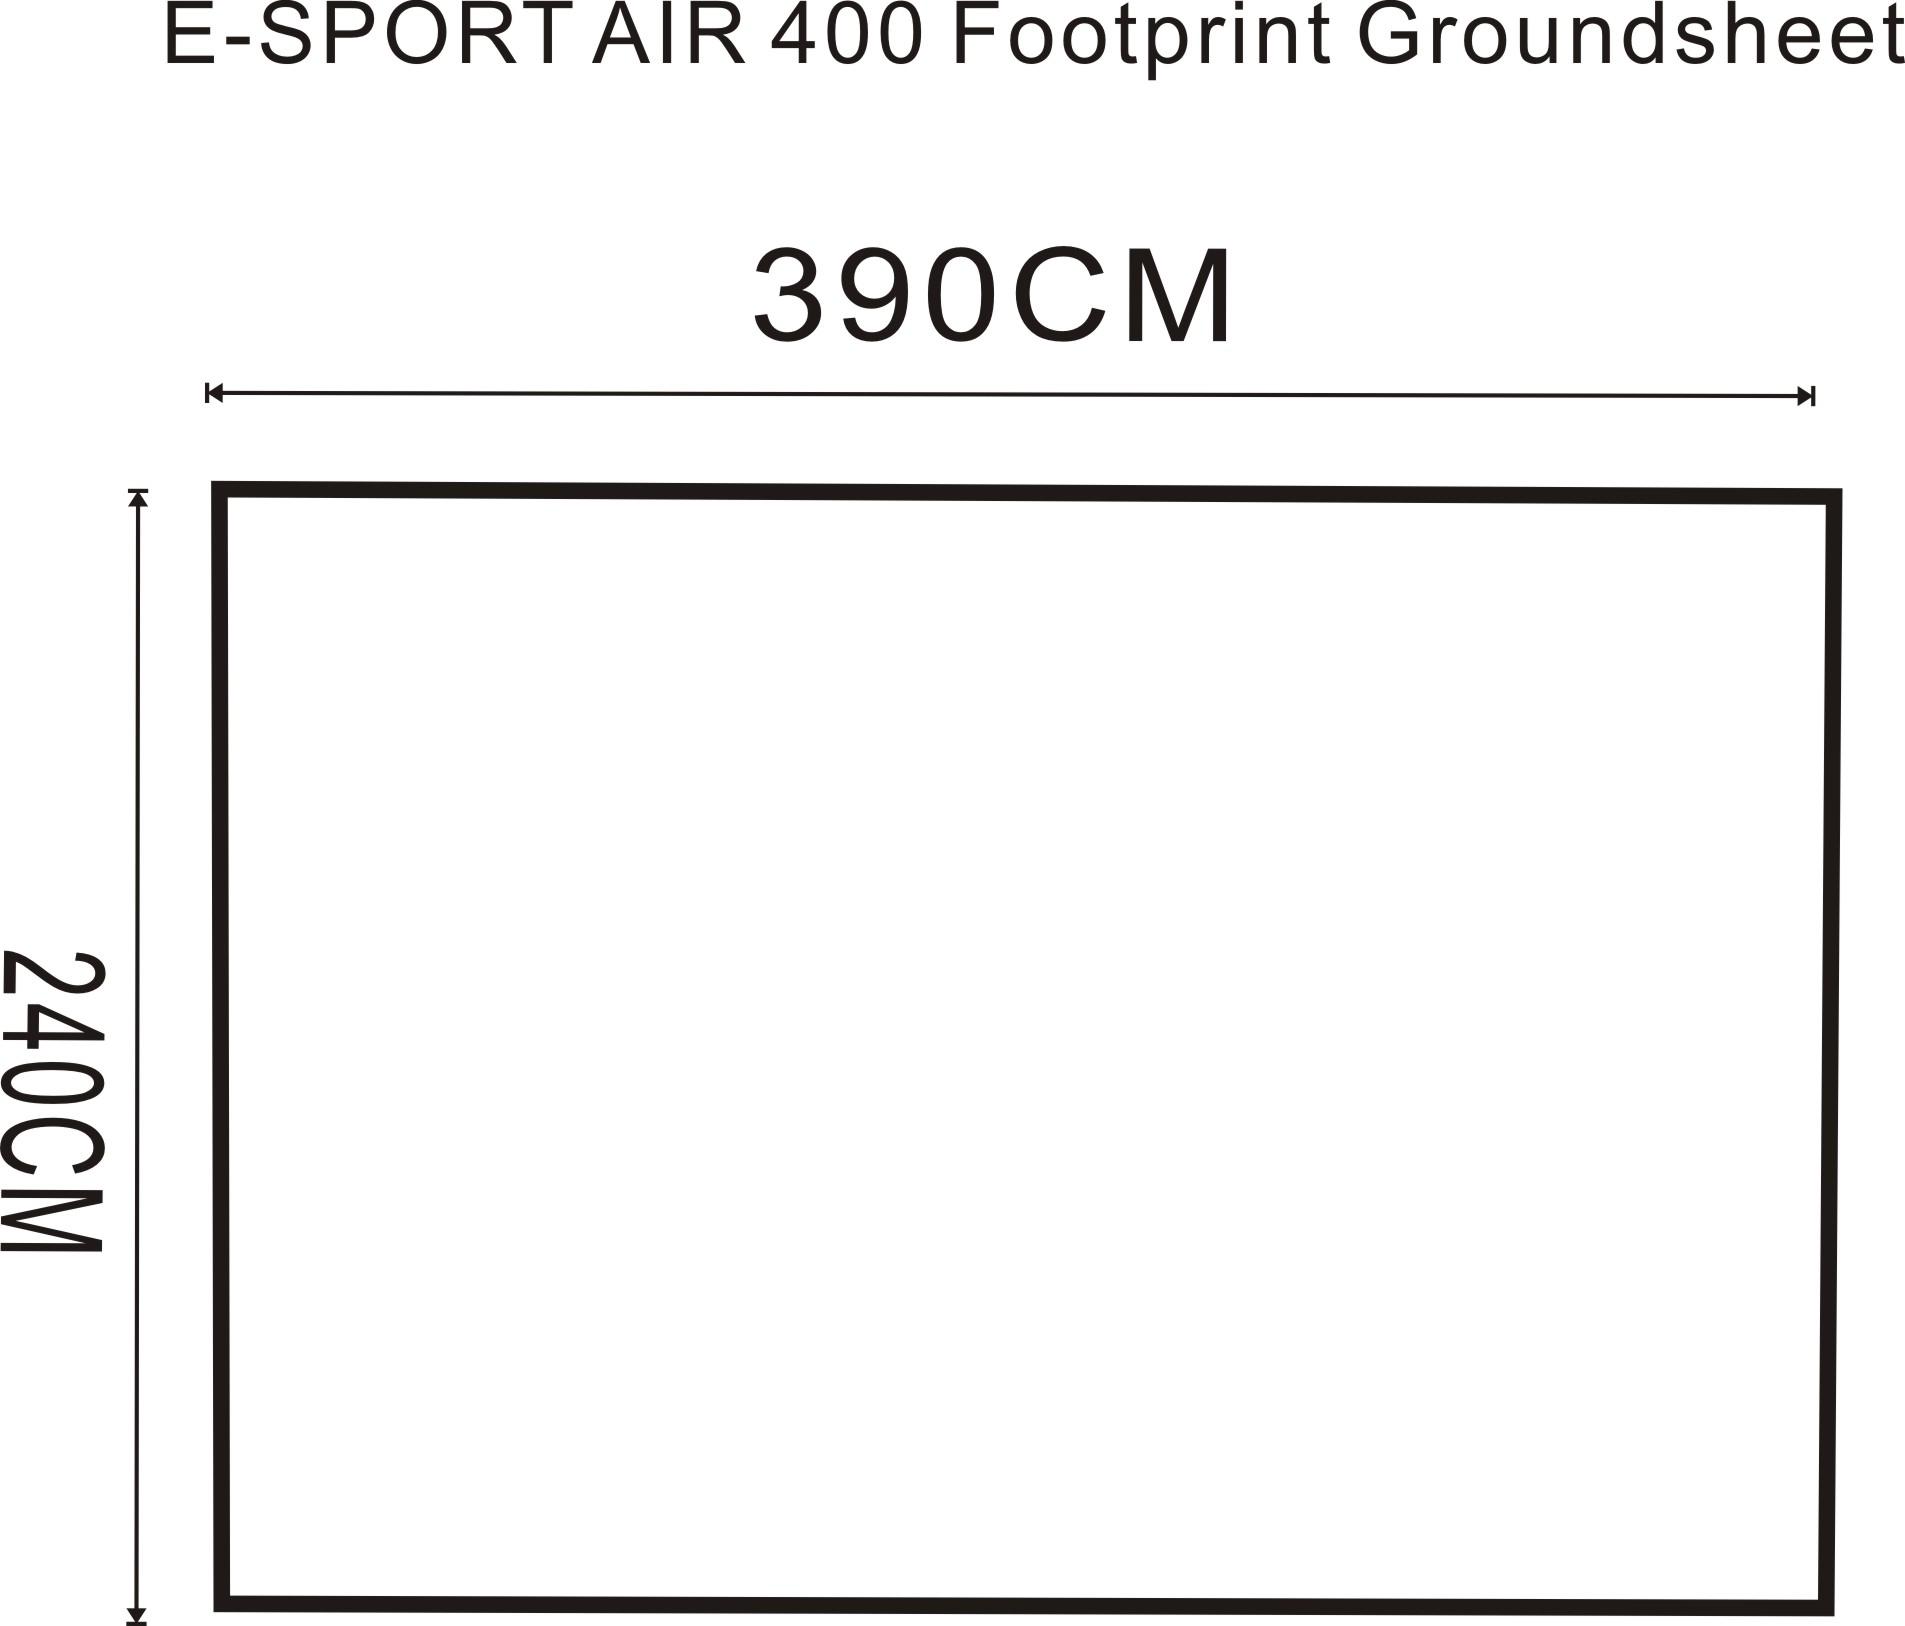 E Sport Air 400 Footprint